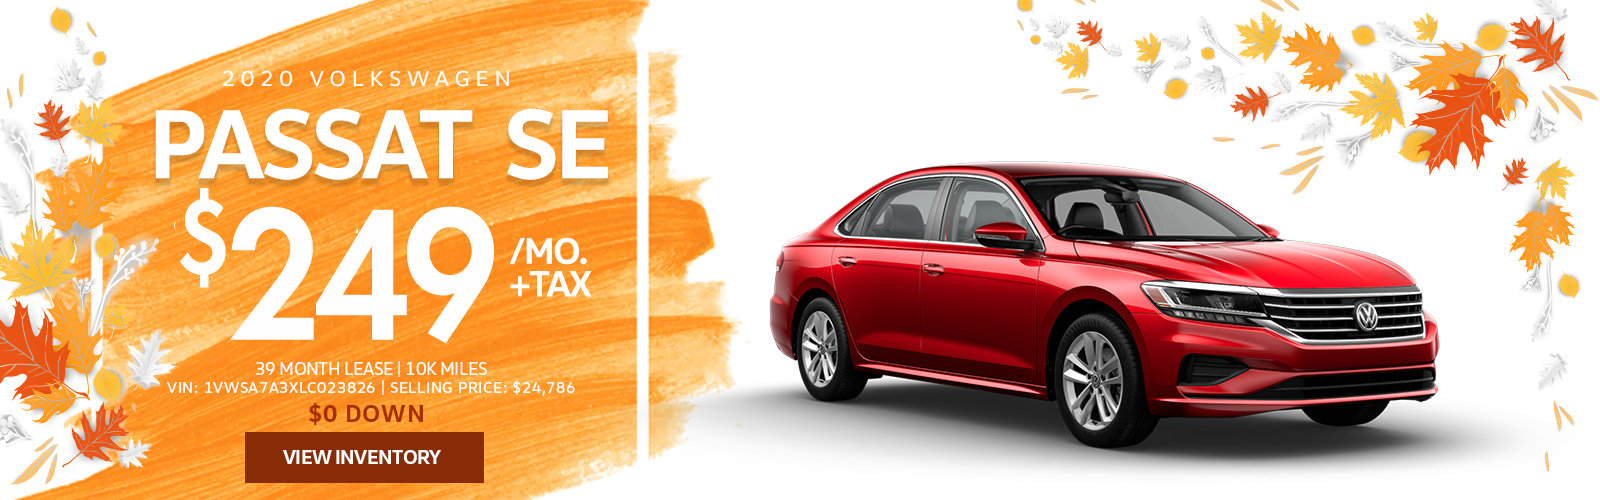 Lease a 2020 Passat SE for $249/mo.